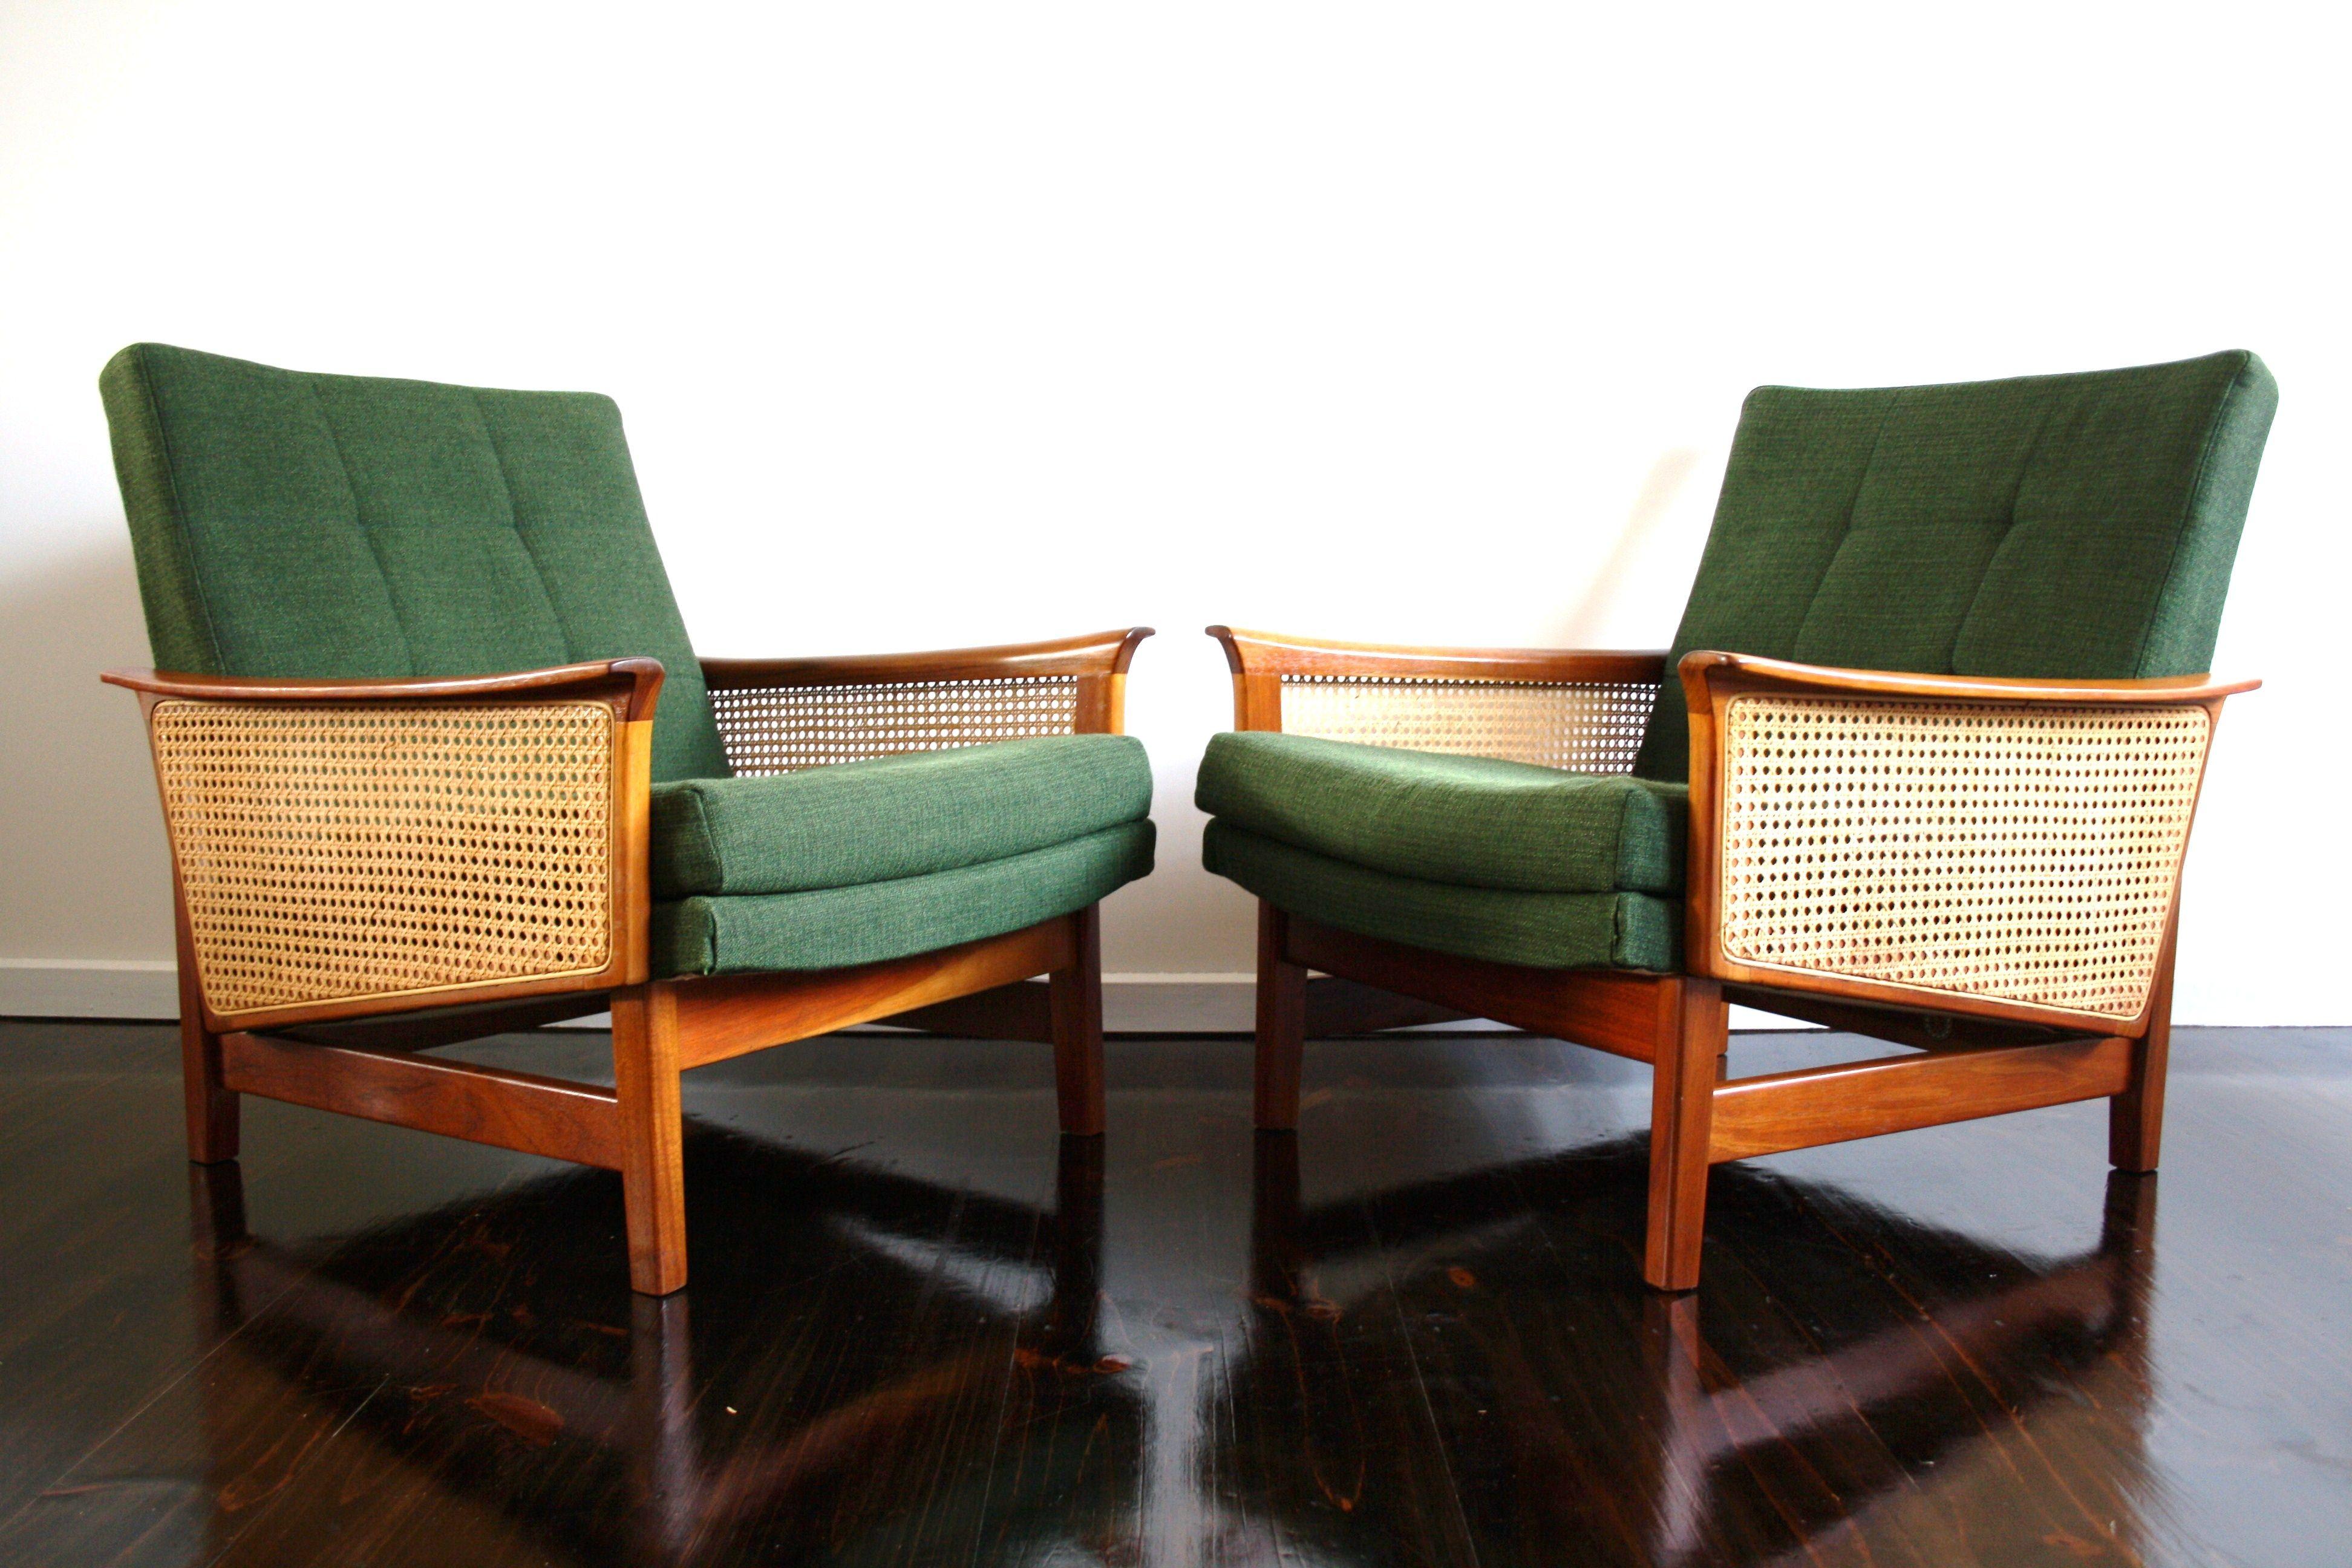 Retro modern chairs - Fler Mid Century Armchairs Chairs Teak Rattan Cane Retro Vintage 360 Modern Furniture